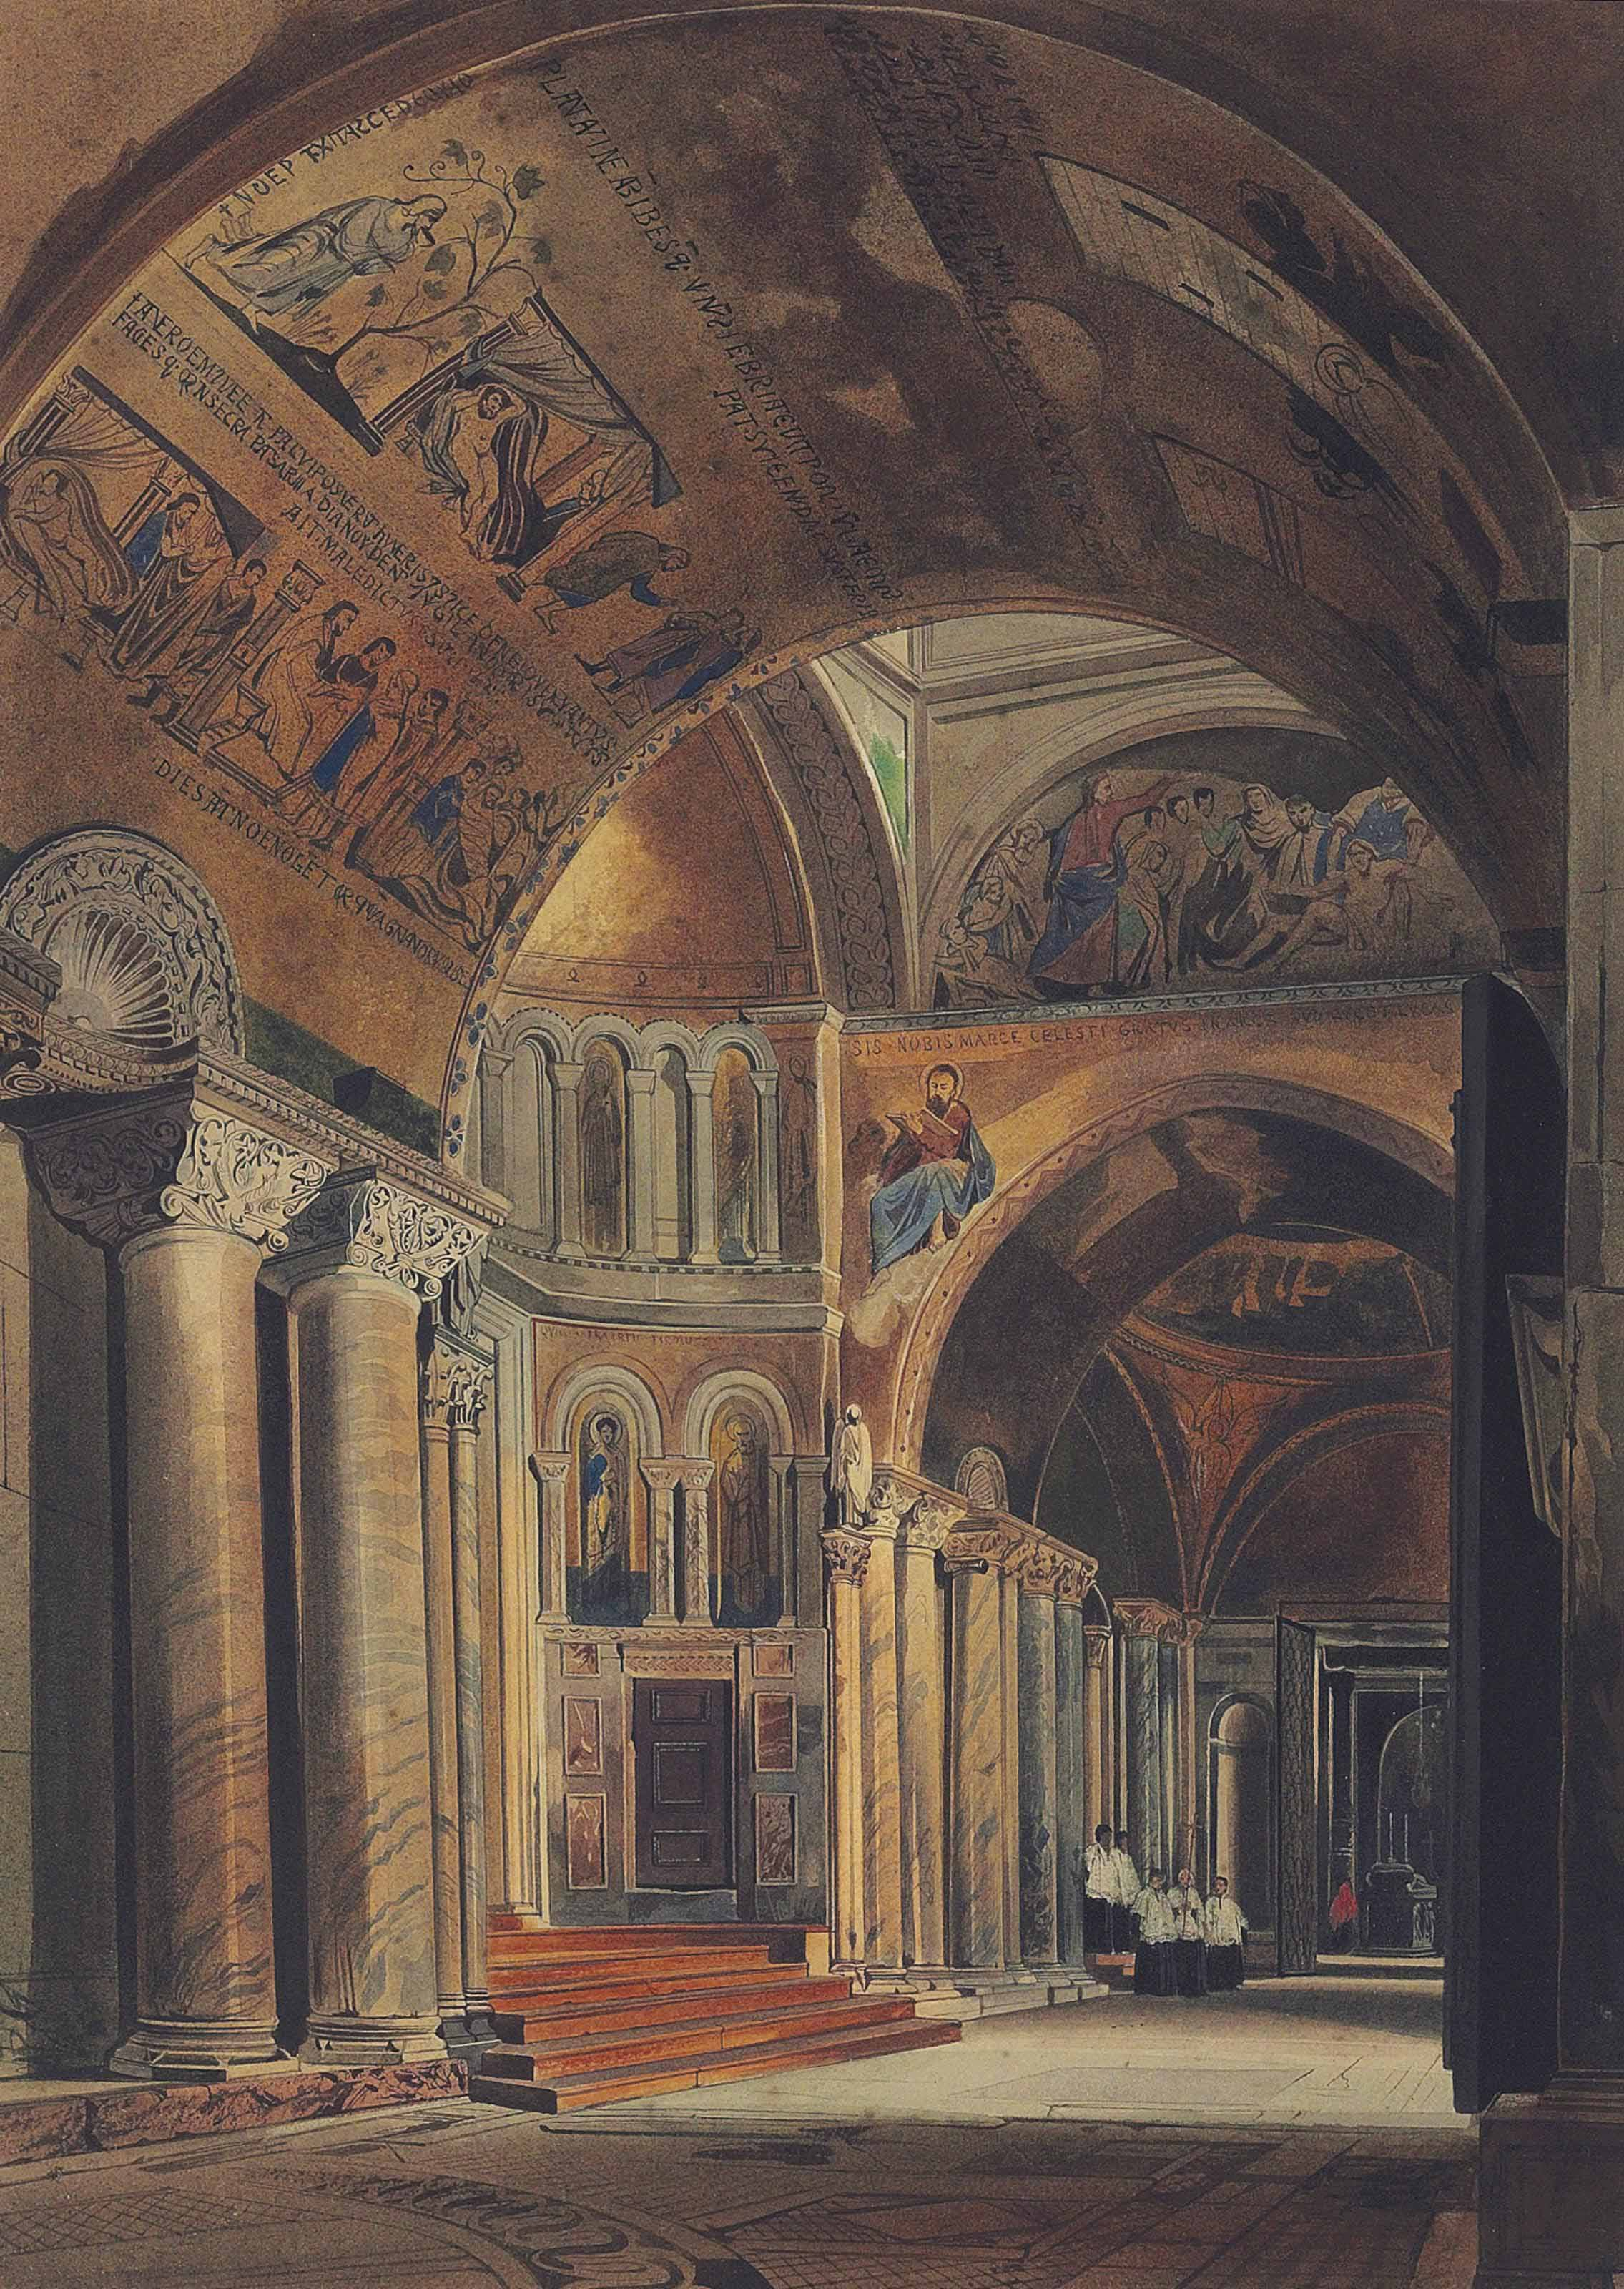 The interior vestibule of St Mark's, Venice